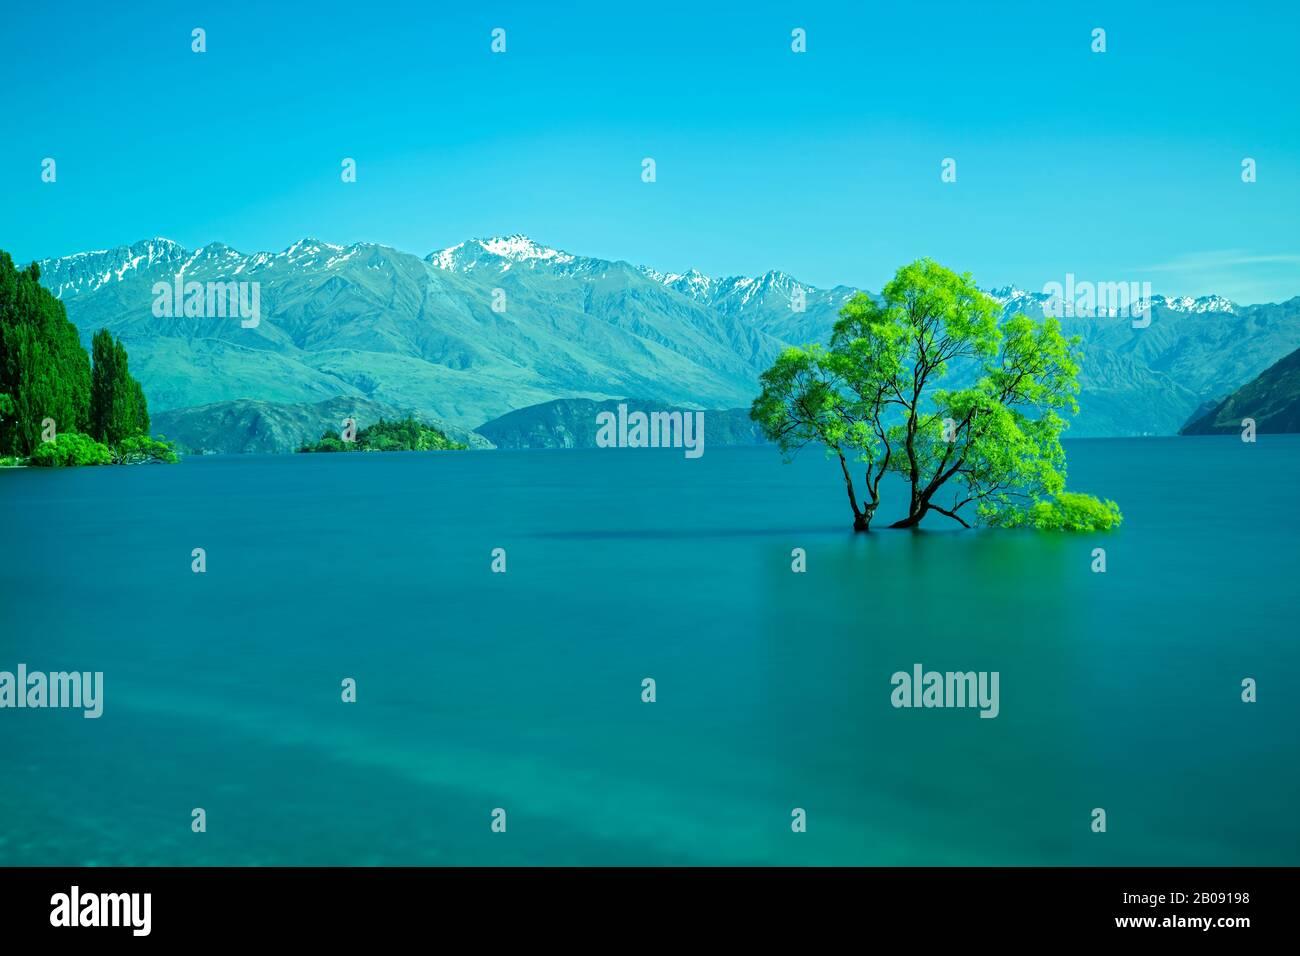 view of the famous Wanaka tree, taken with long shutter speed, in Lake Wanaka, South Island, New Zealand 29 November 2019 Stock Photo